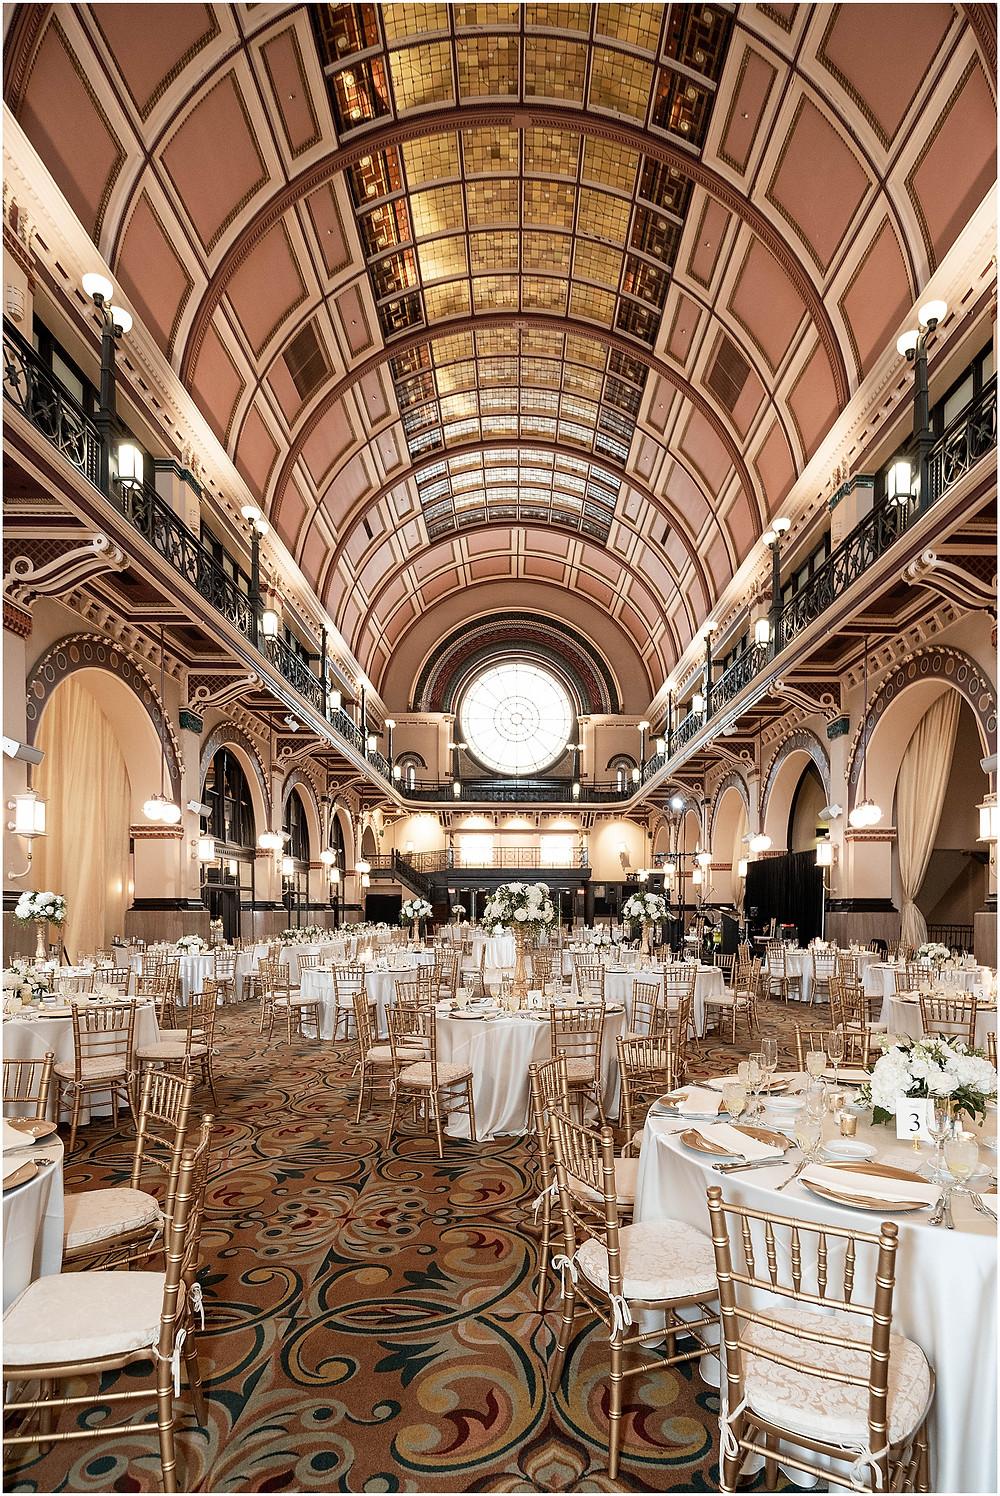 Ballroom-Union-Station-Hotel-Wedding-Reception